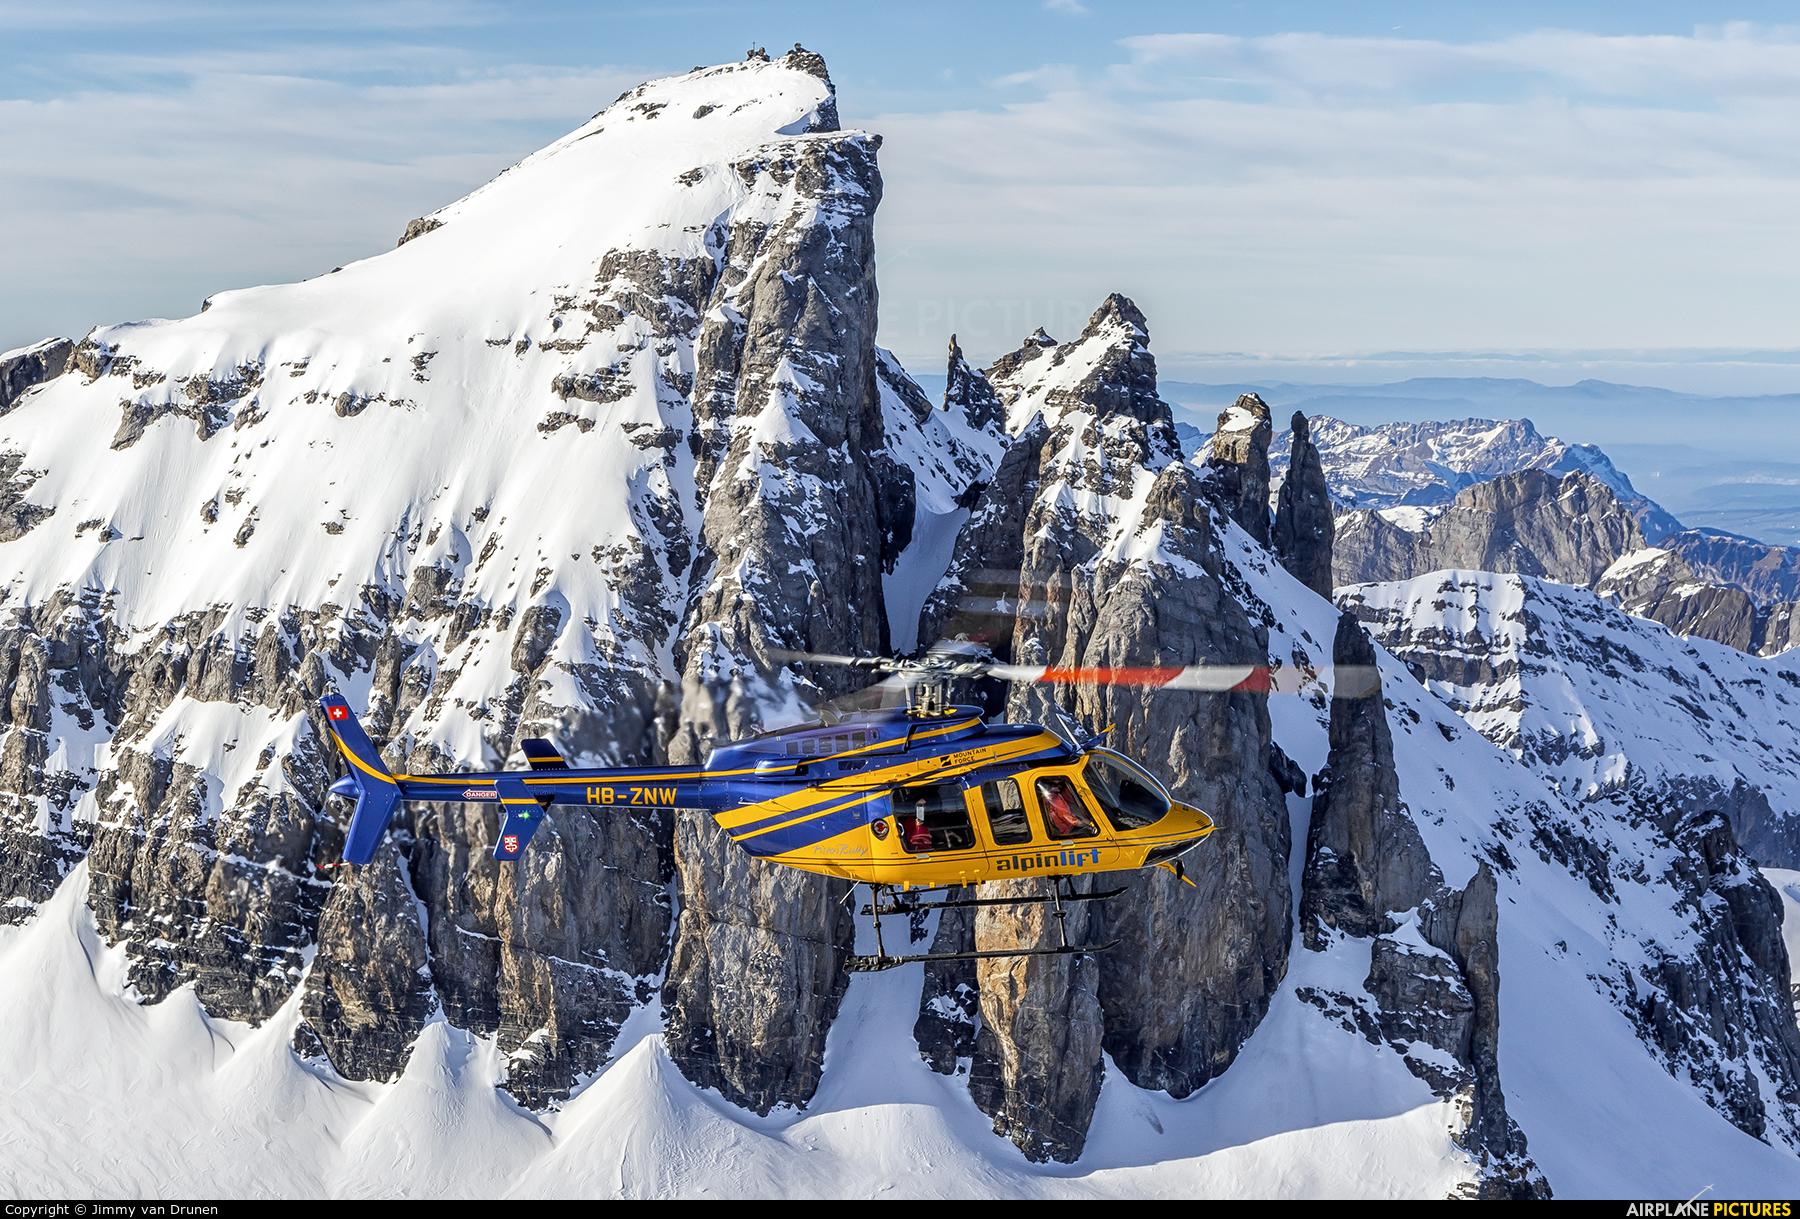 Alpinlift HB-ZNW aircraft at In Flight - Switzerland